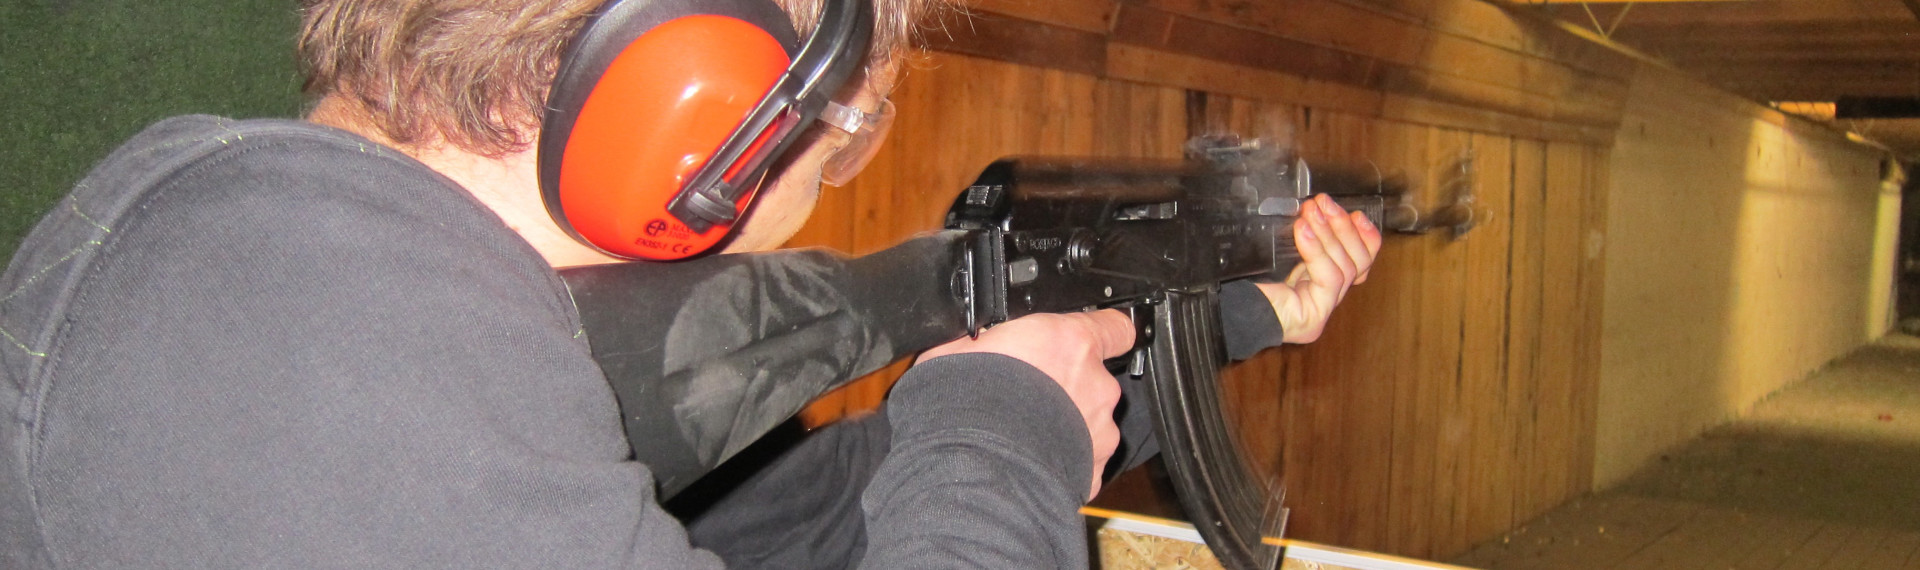 AK-47 Skydning Prag